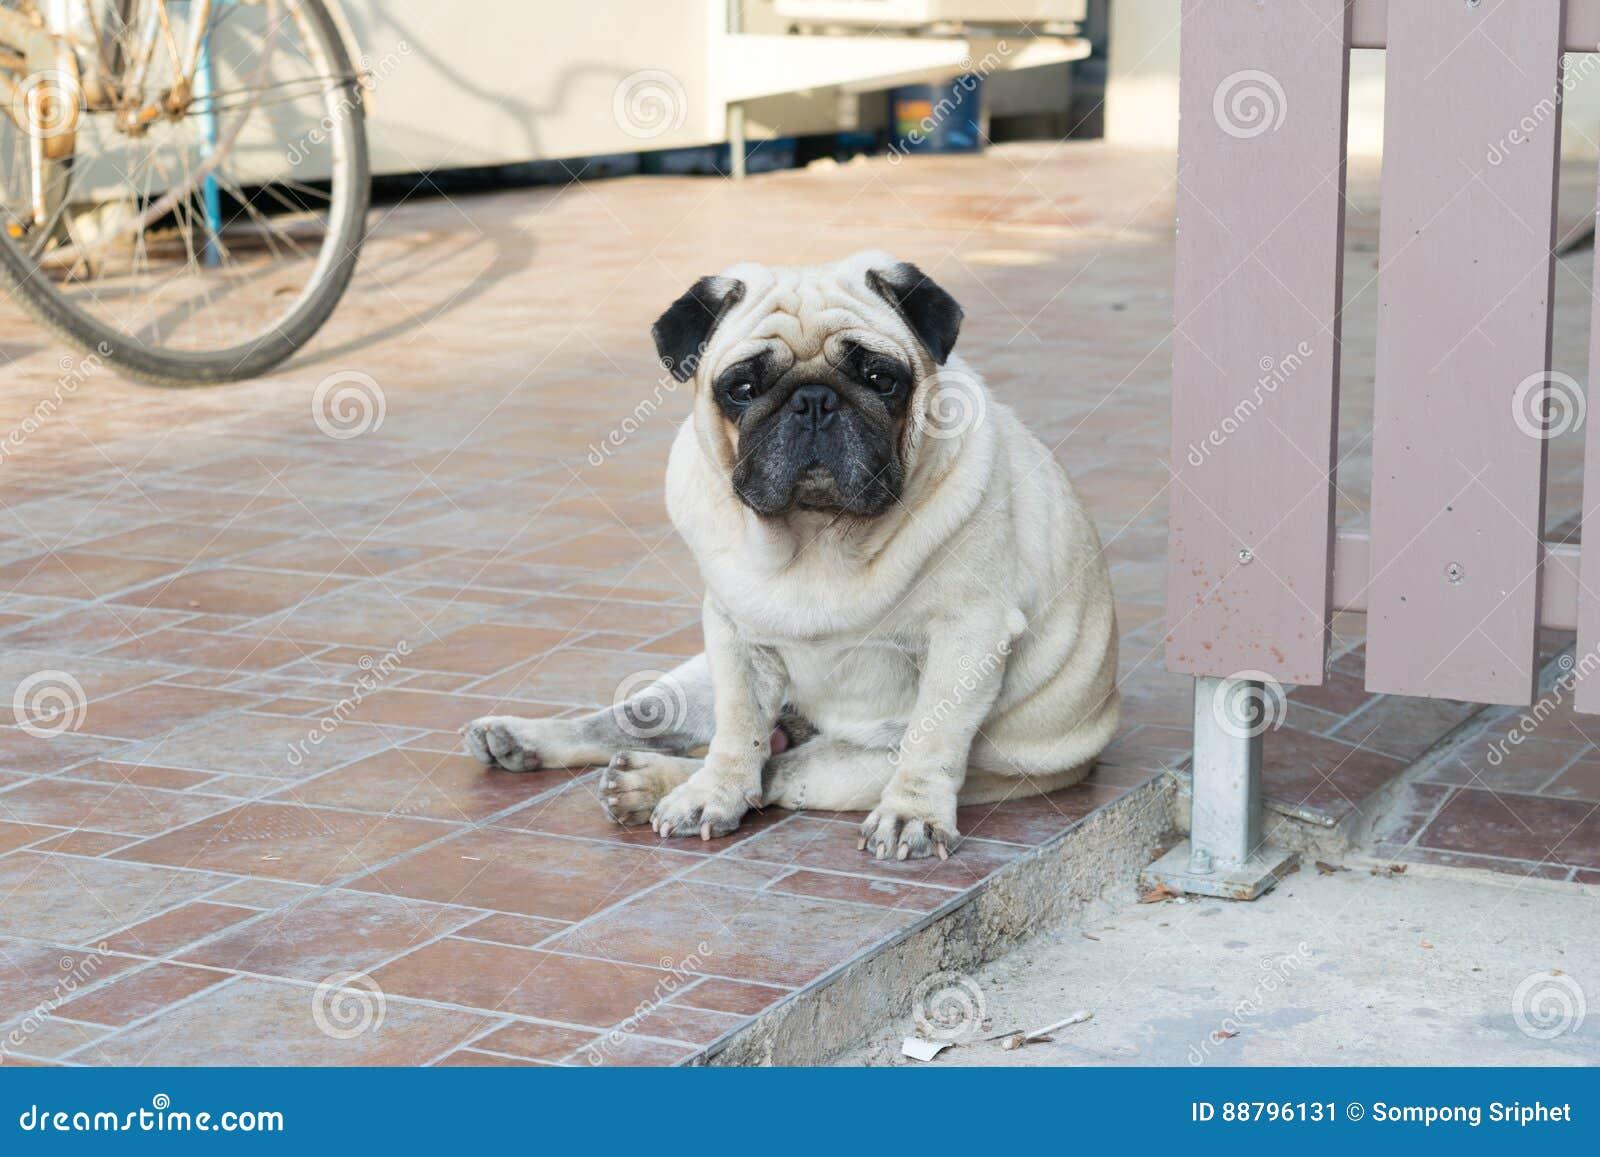 Pug Dog Sitting on the floor